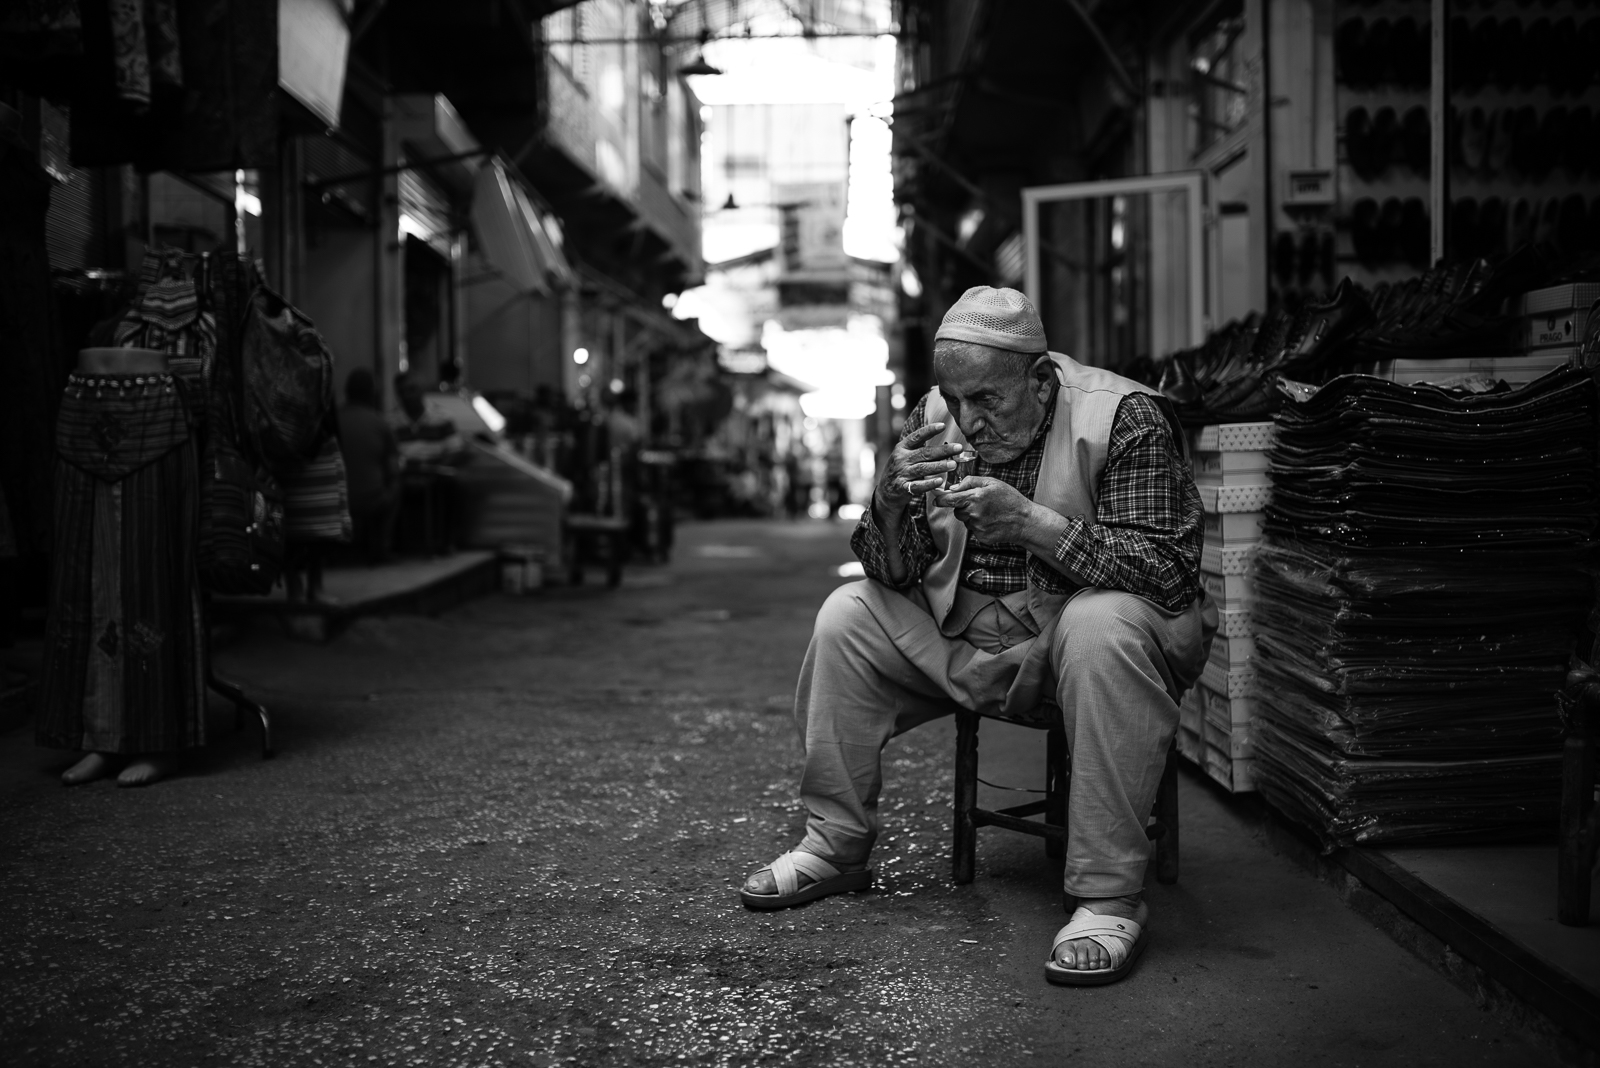 The tea (chai) drinker, Diyarbakir (Turkey)